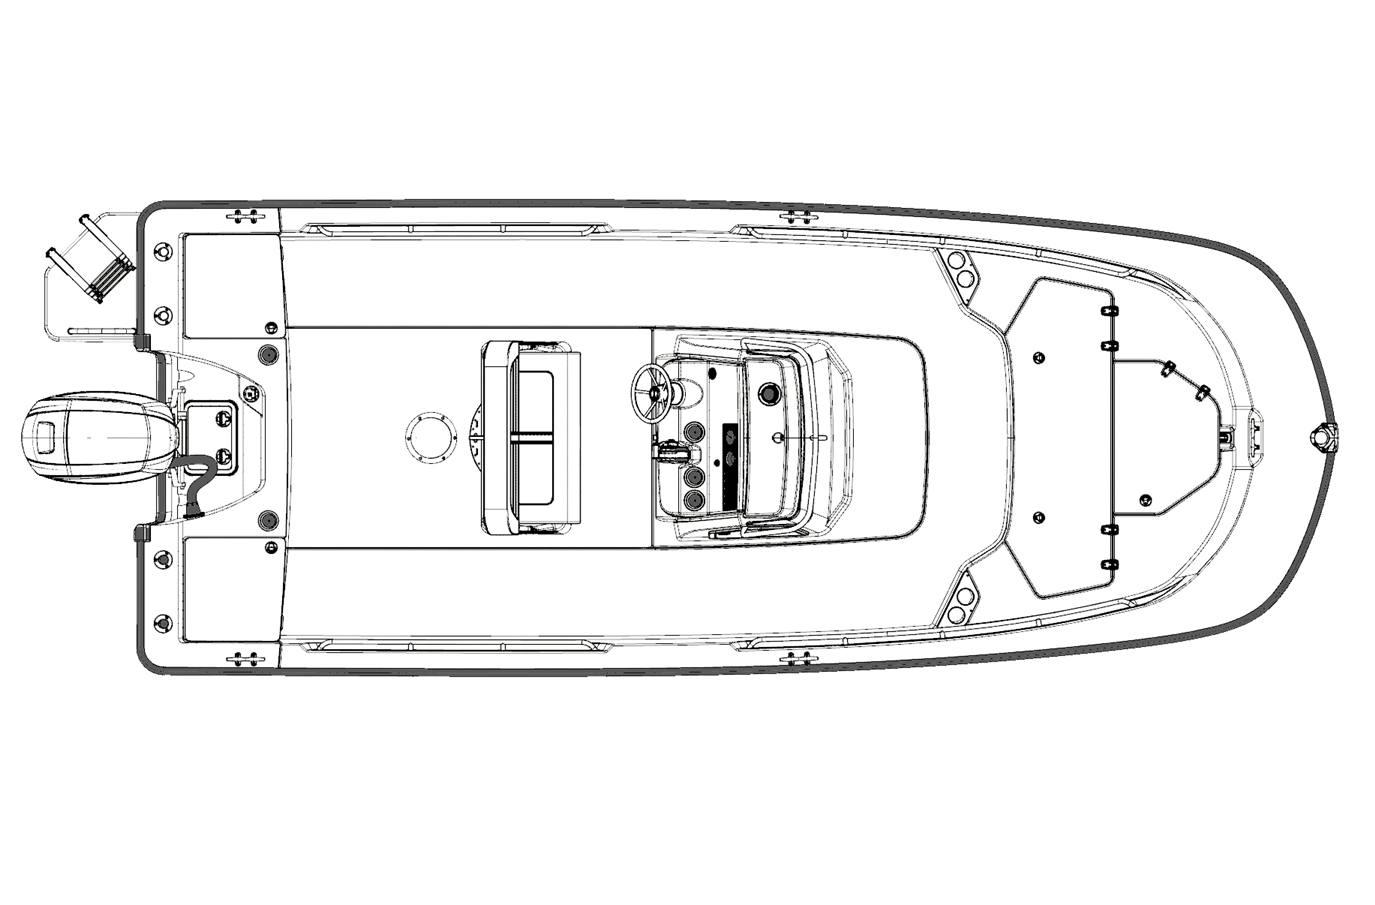 4000 Light Wiring Diagram Further Boat Navigation Light Wiring Diagram